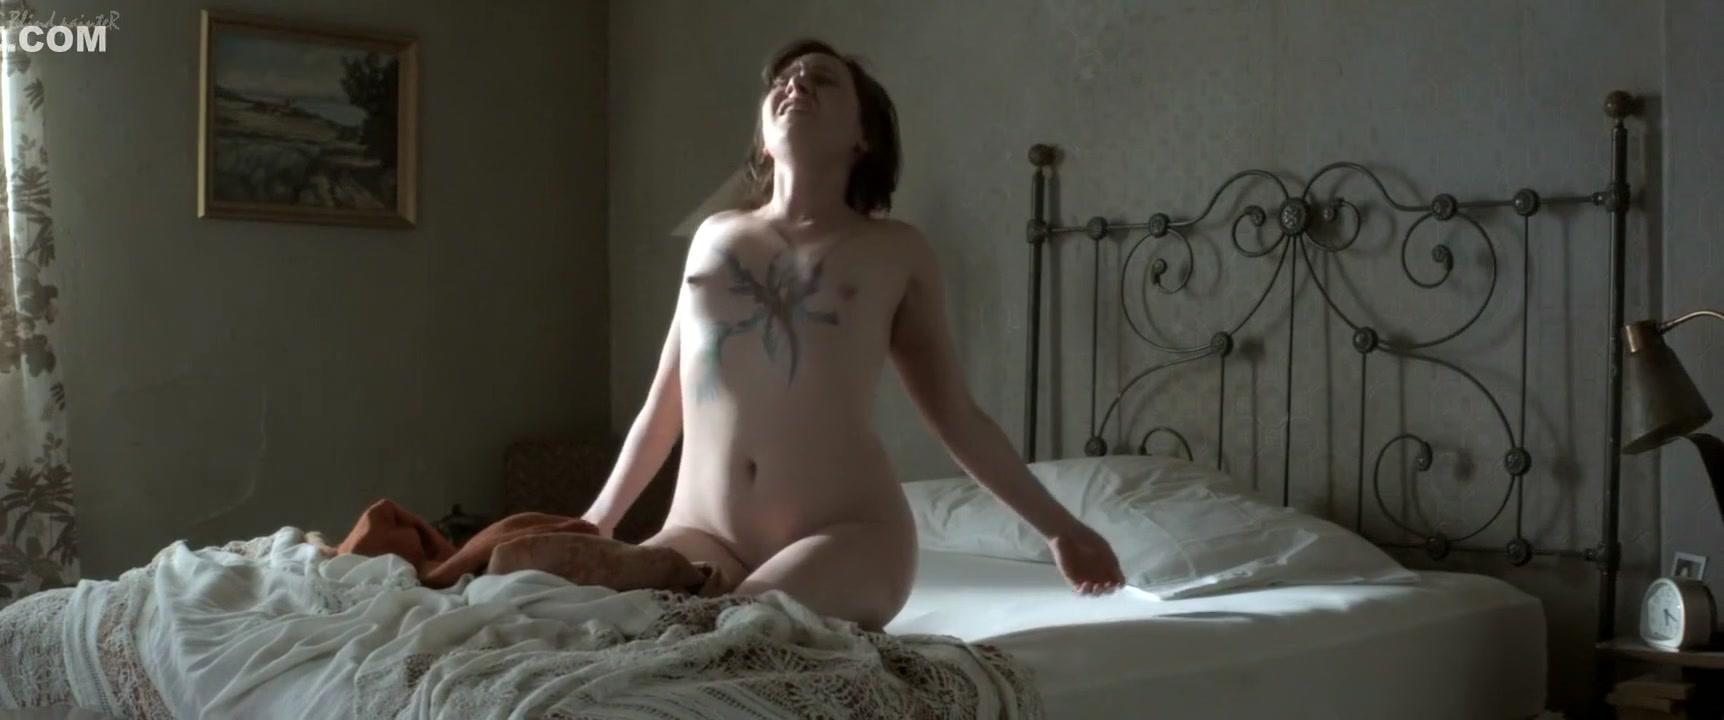 Kurtakoti sowmya s&mdating Porn Pics & Movies